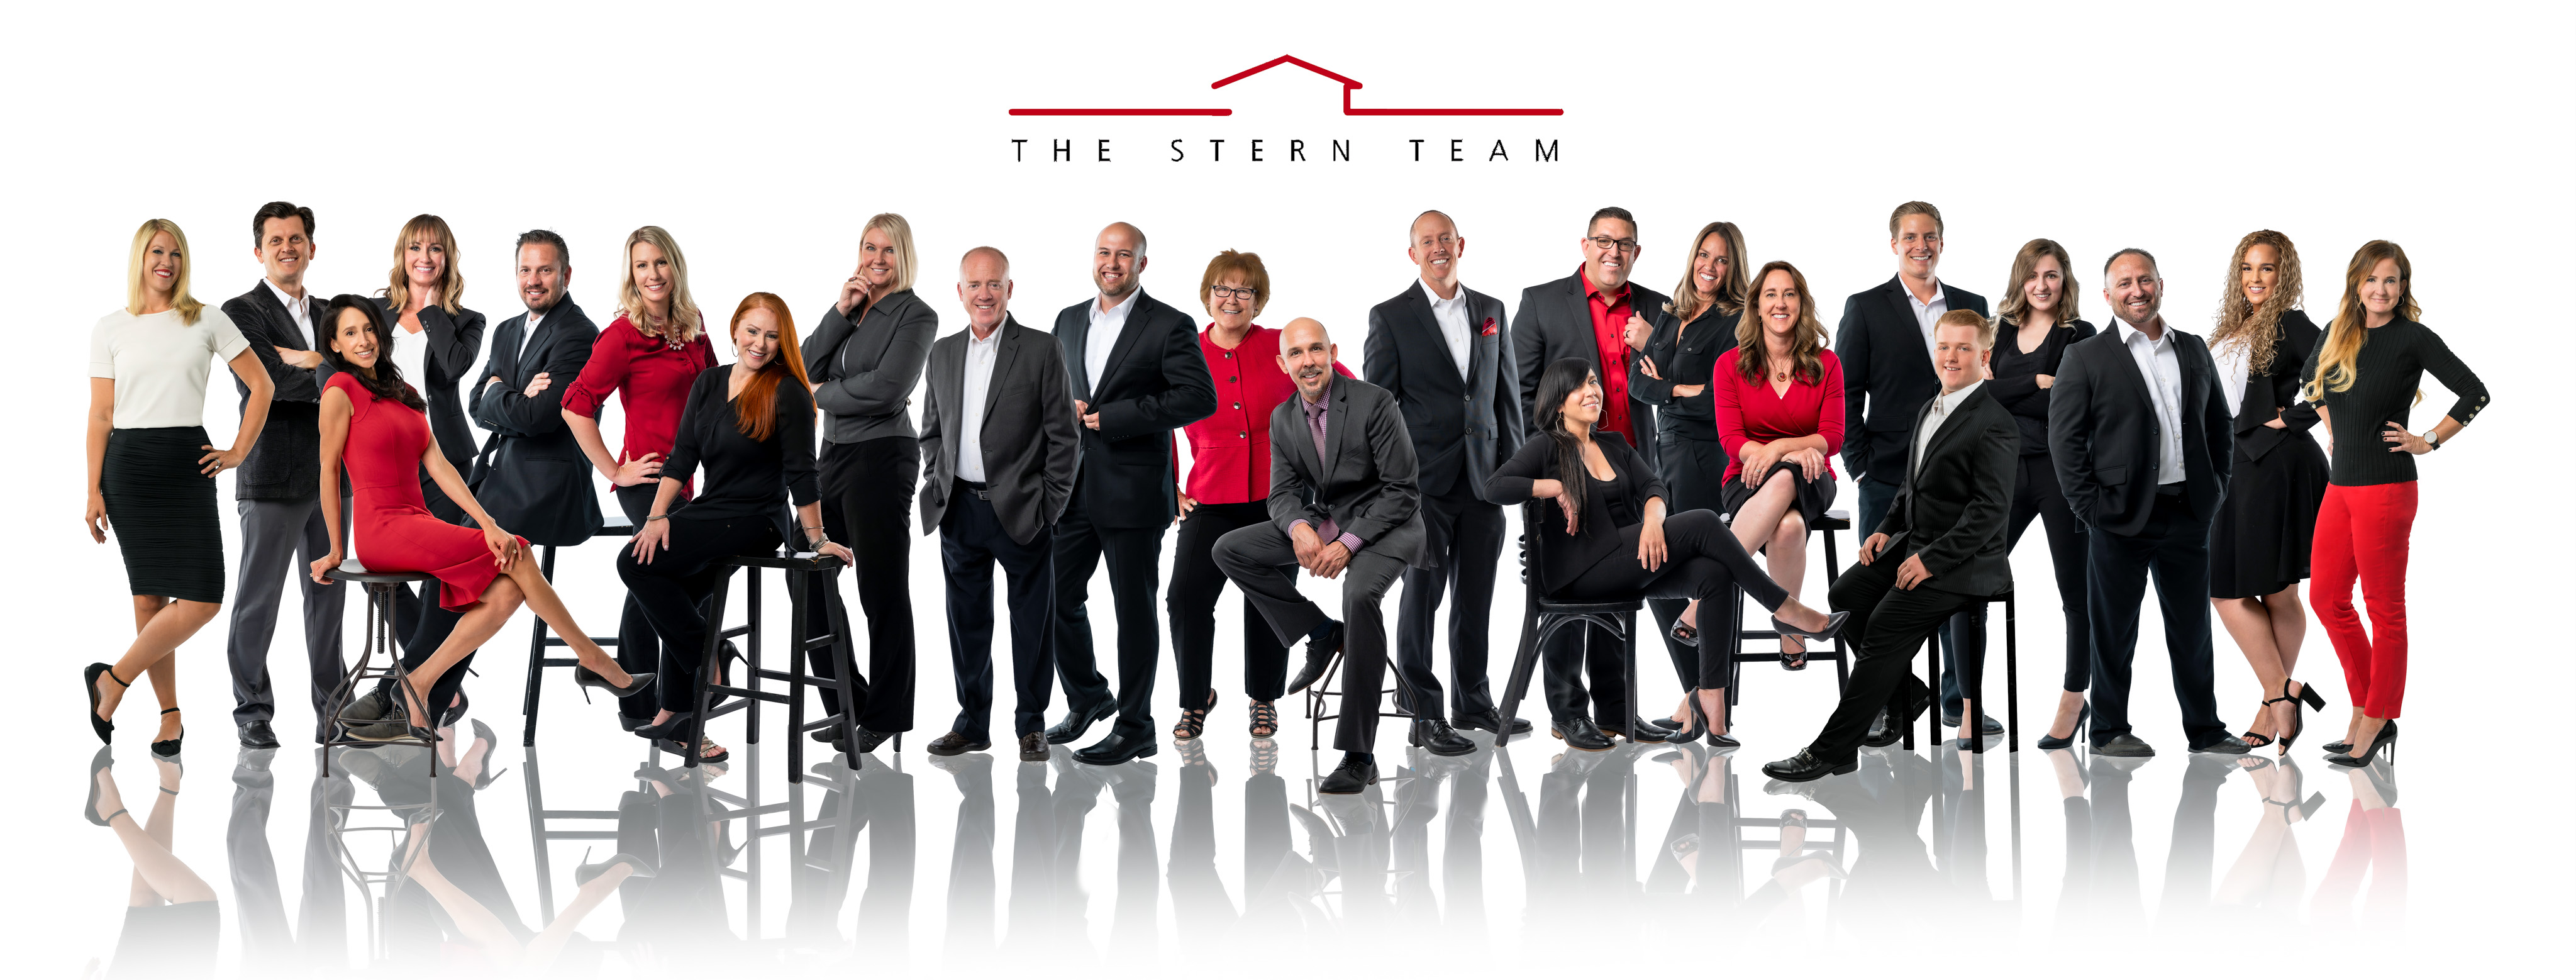 the stern team poster 2 (1).jpg